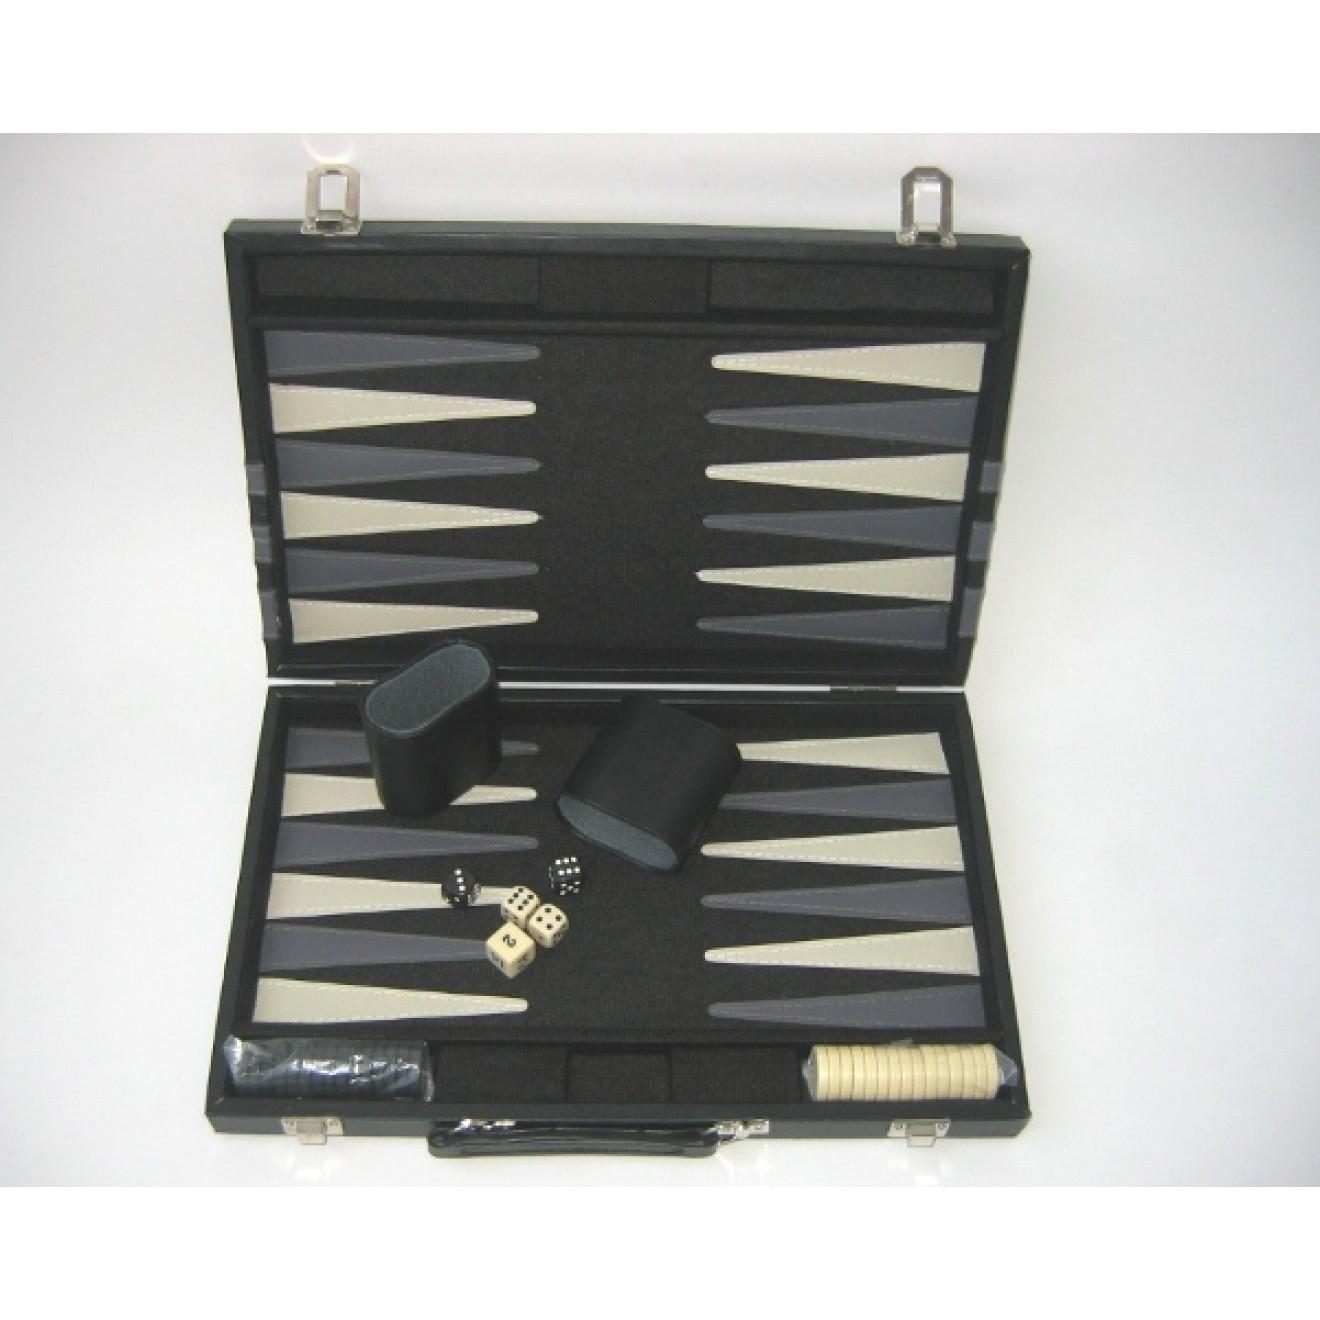 Backgammon Koffer Black Basic 36 X 24 Cm Ausführung Ii Wahl